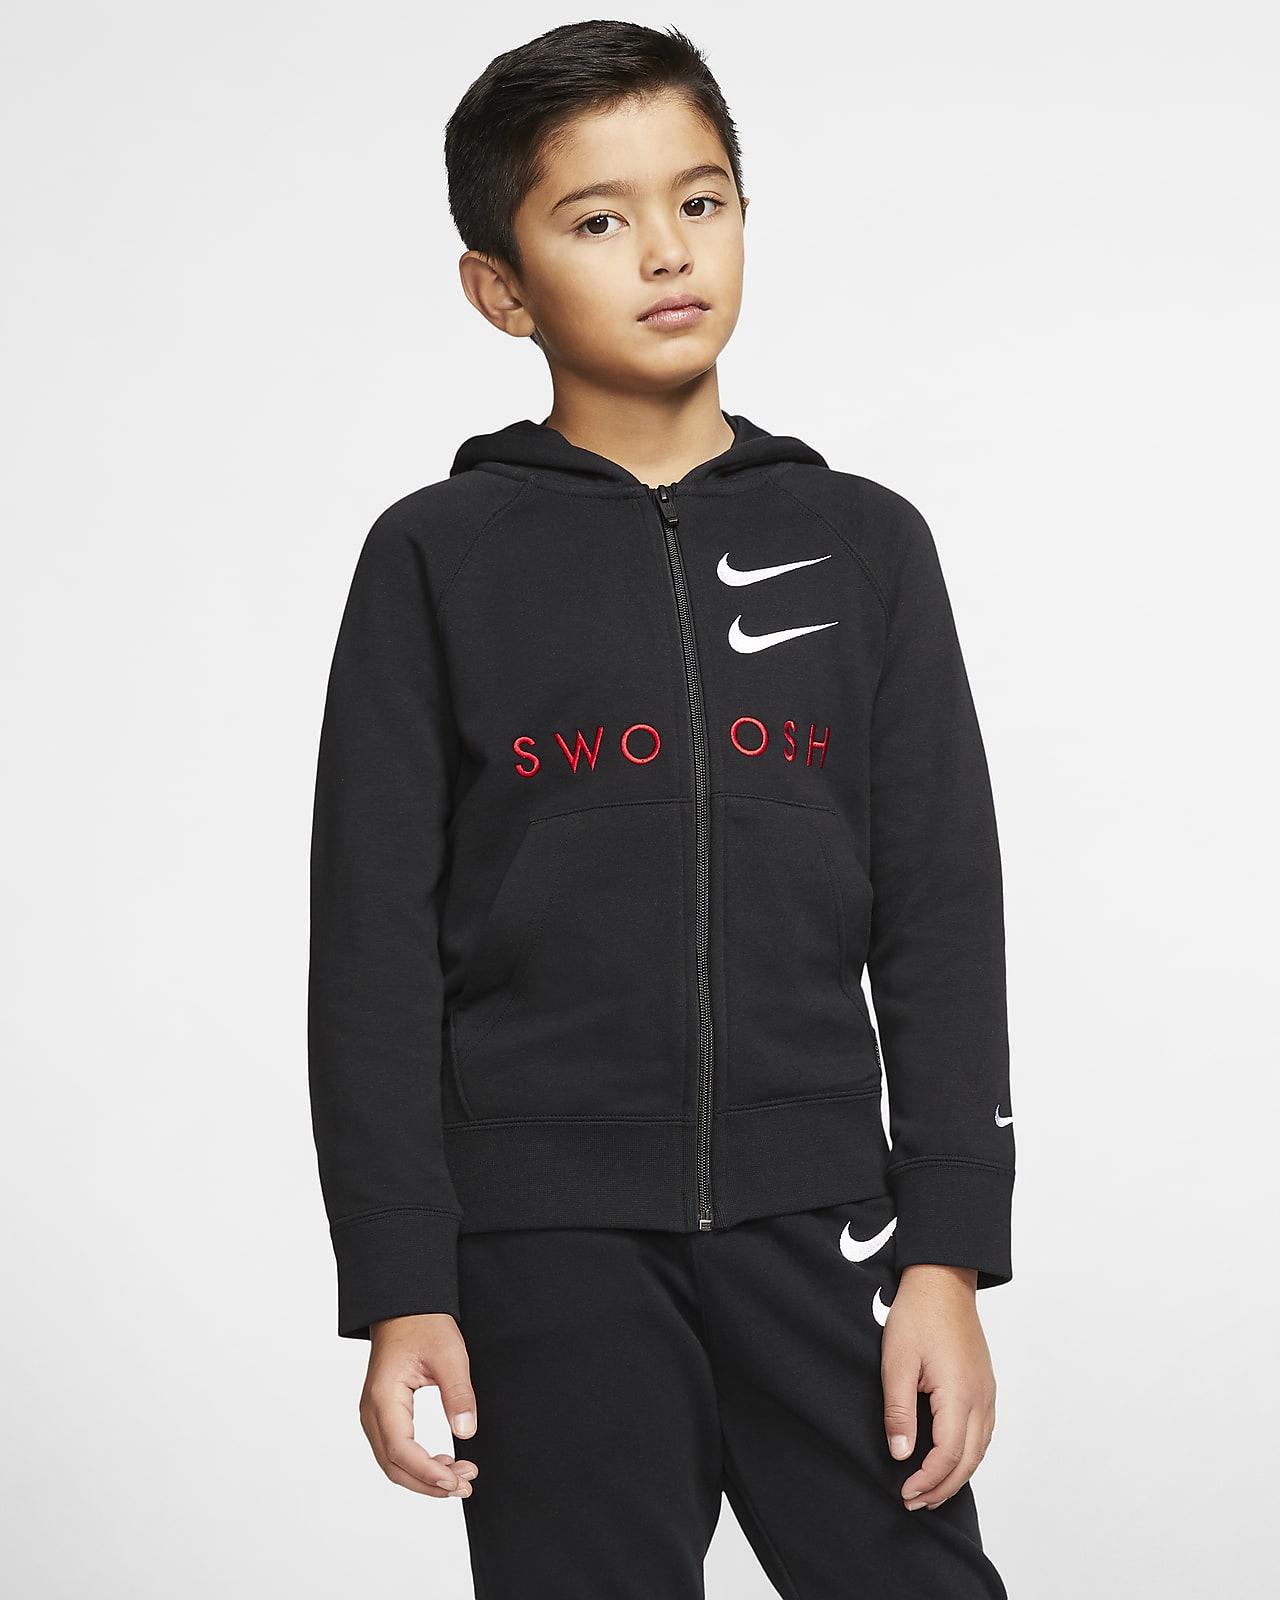 Nike Sportswear Swoosh Dessuadora amb caputxa i cremallera completa de teixit French Terry - Nen